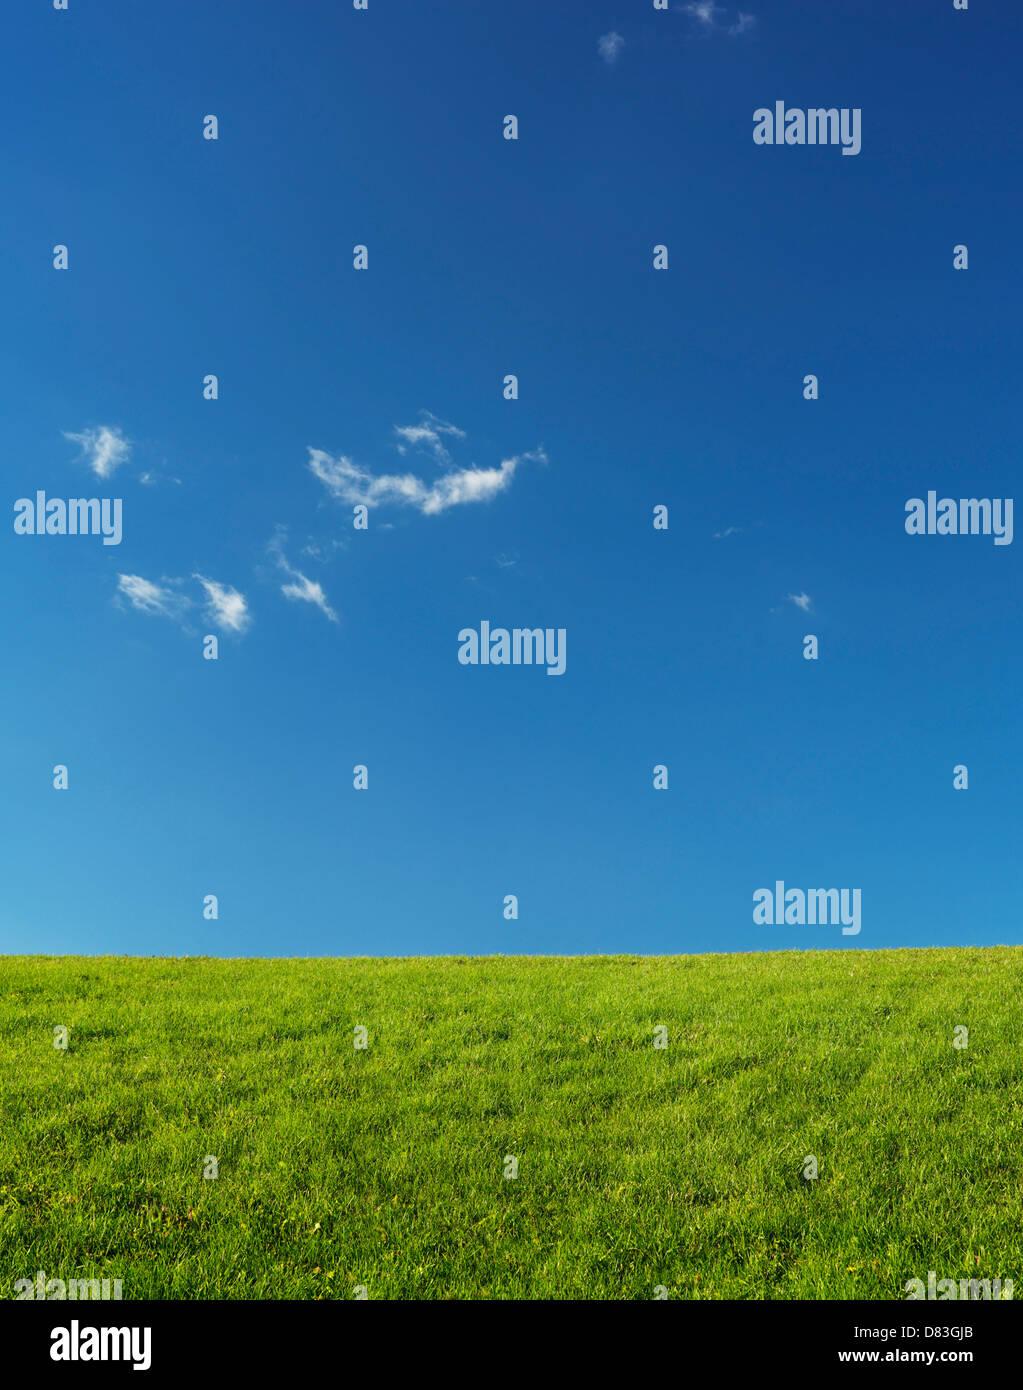 Green grassland landscape under blue clear sky lit by sunlight. Nature backdrop background. - Stock Image